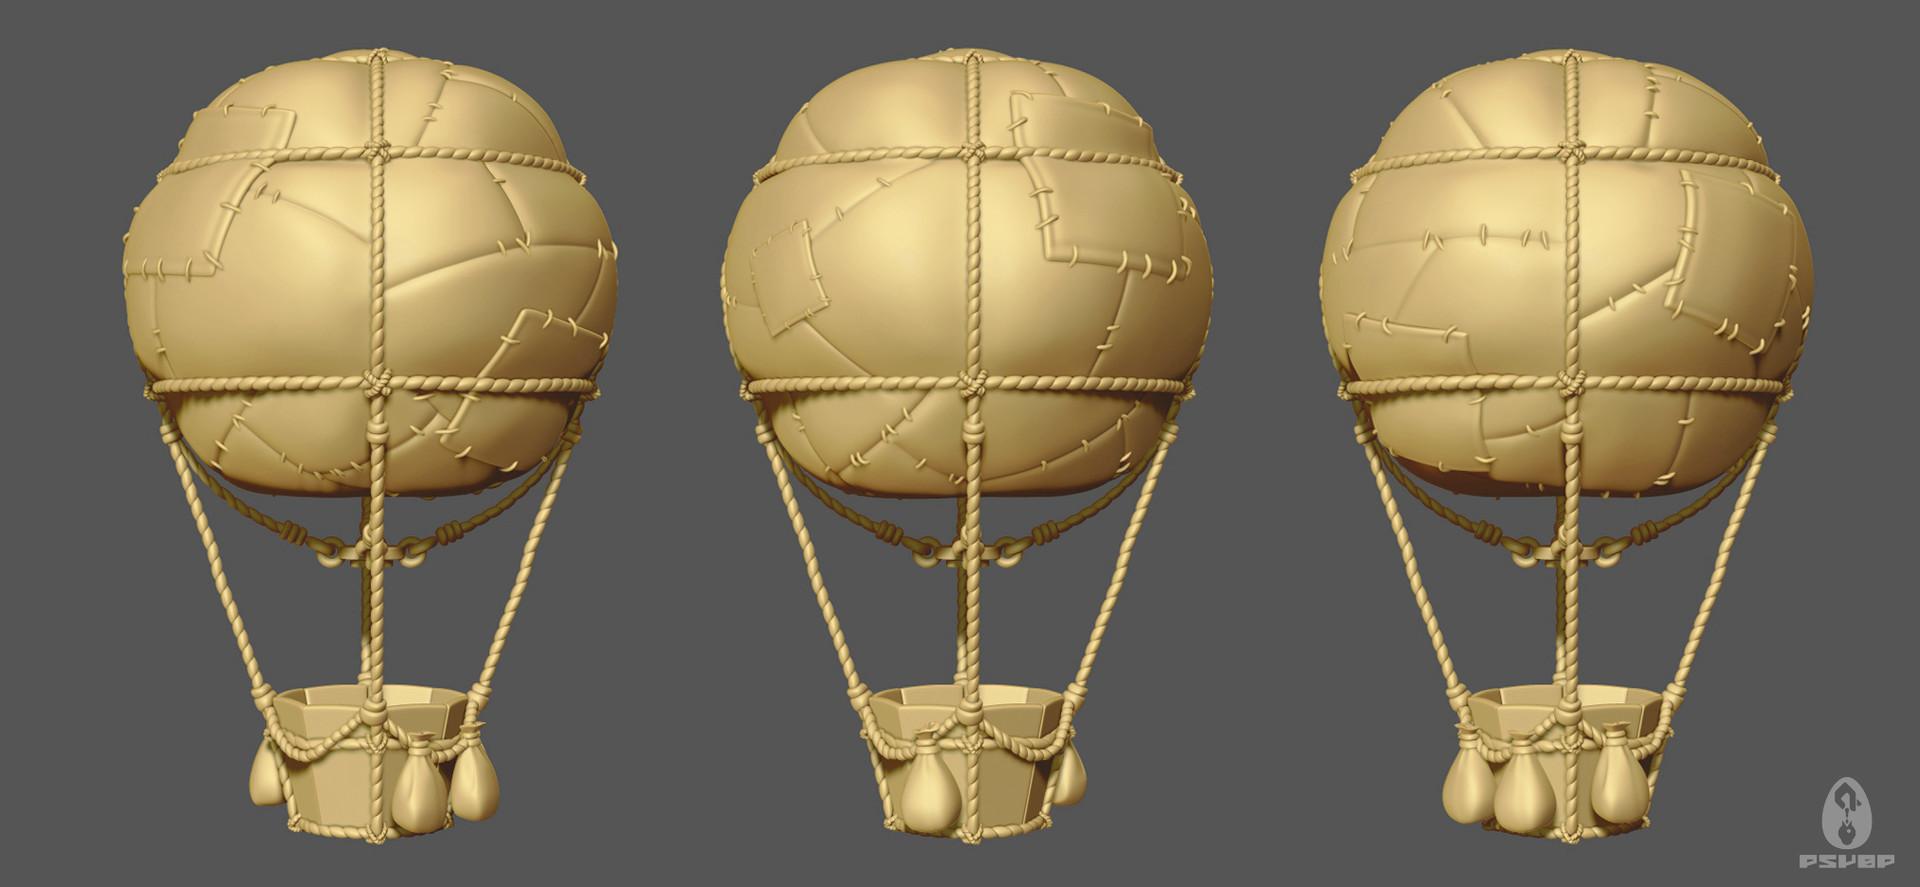 Tyler bolyard balloonv001